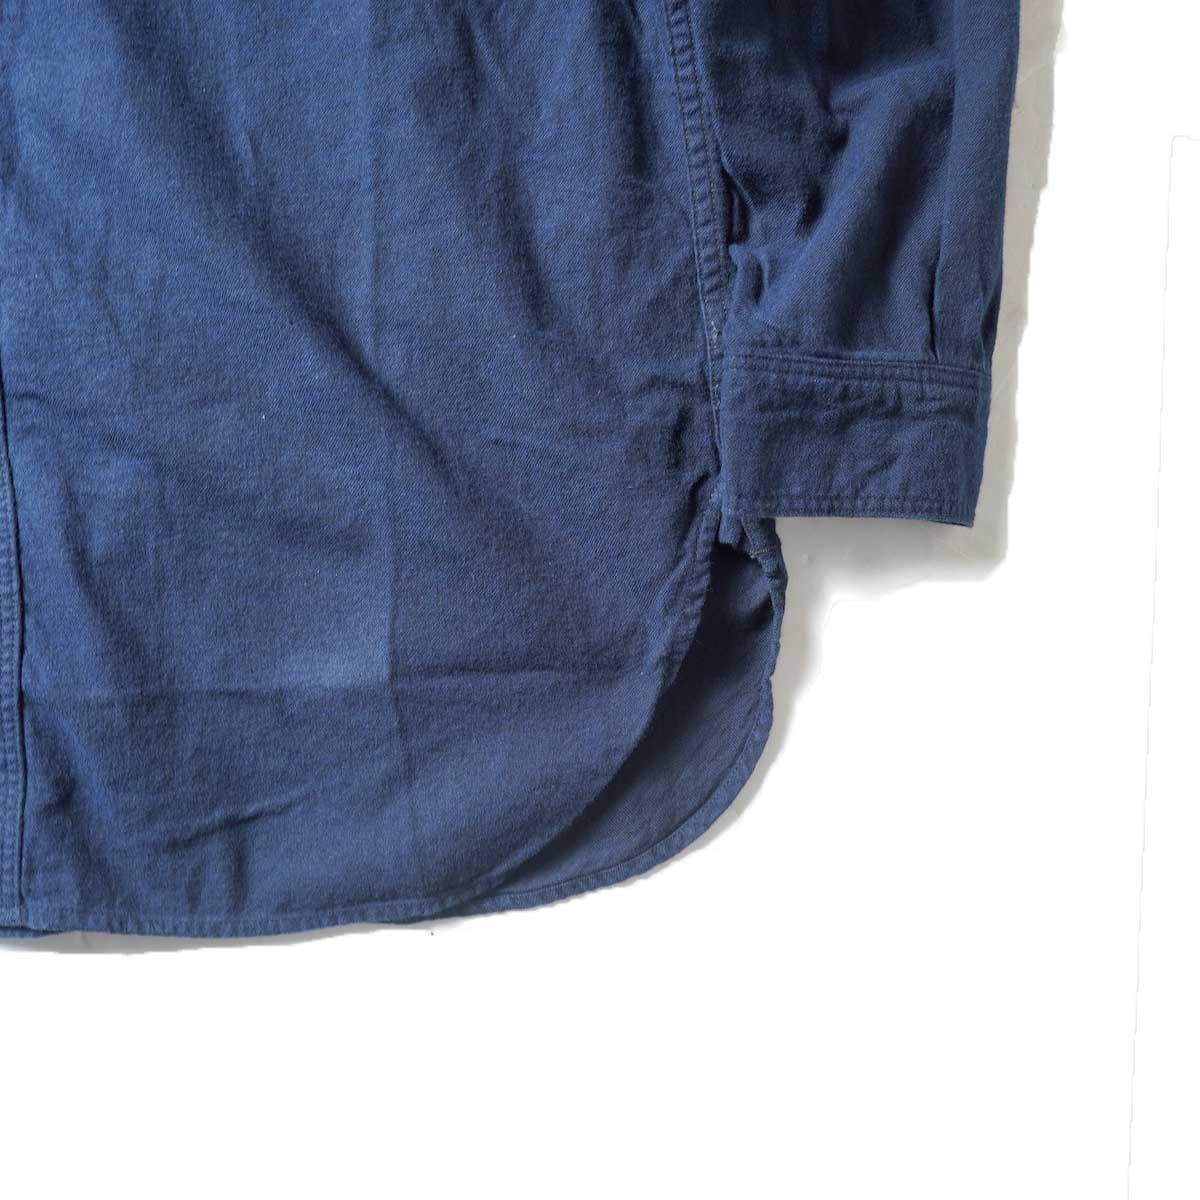 orSlow / VINTAGE FIT WORK SHIRT (Navy)裾、袖